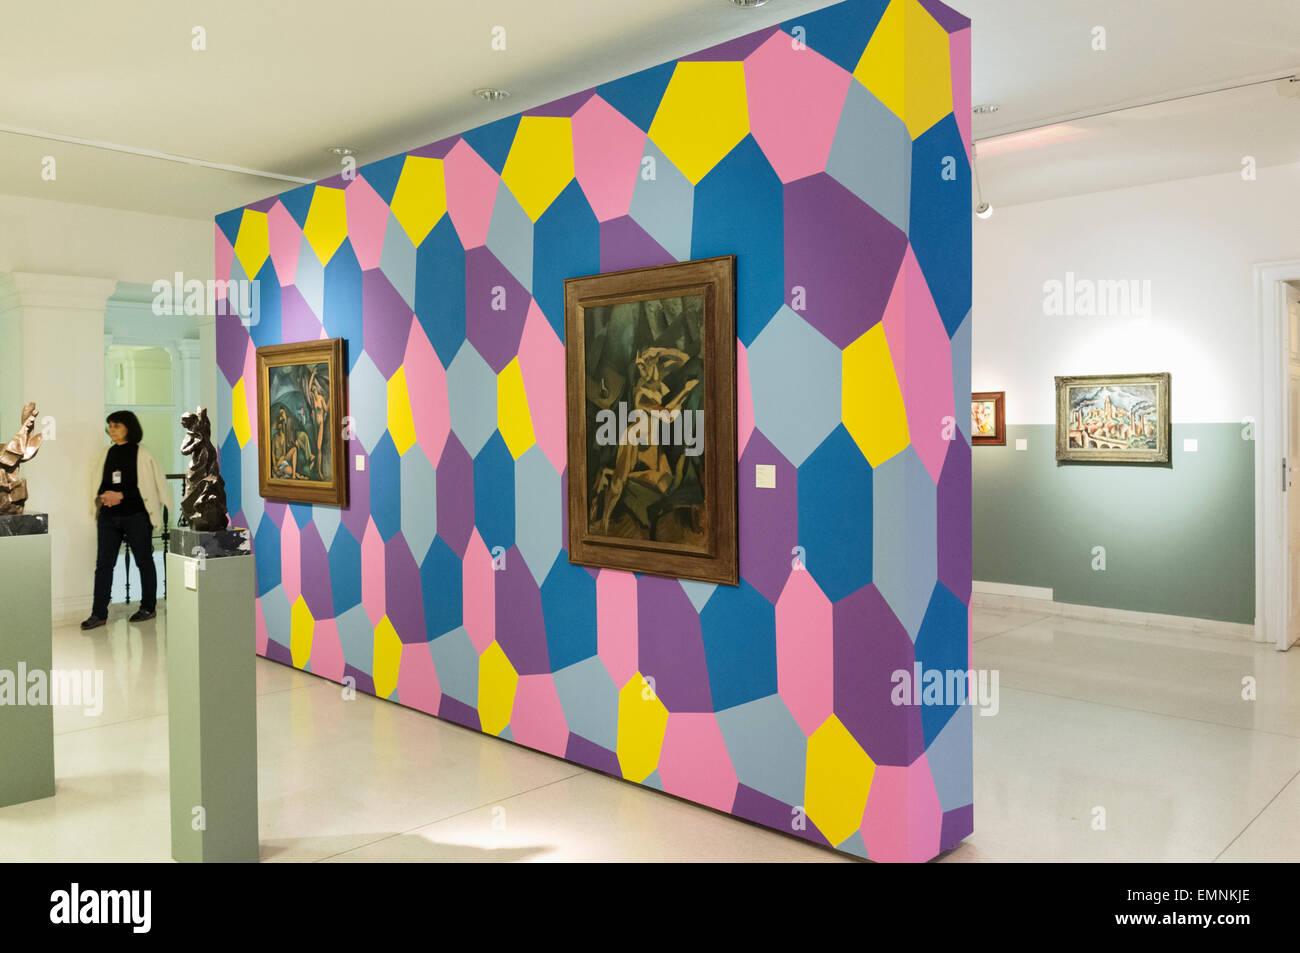 Czech Cubism. Moravian Gallery, modern art museum in Brno, Czech Republic - Stock Image